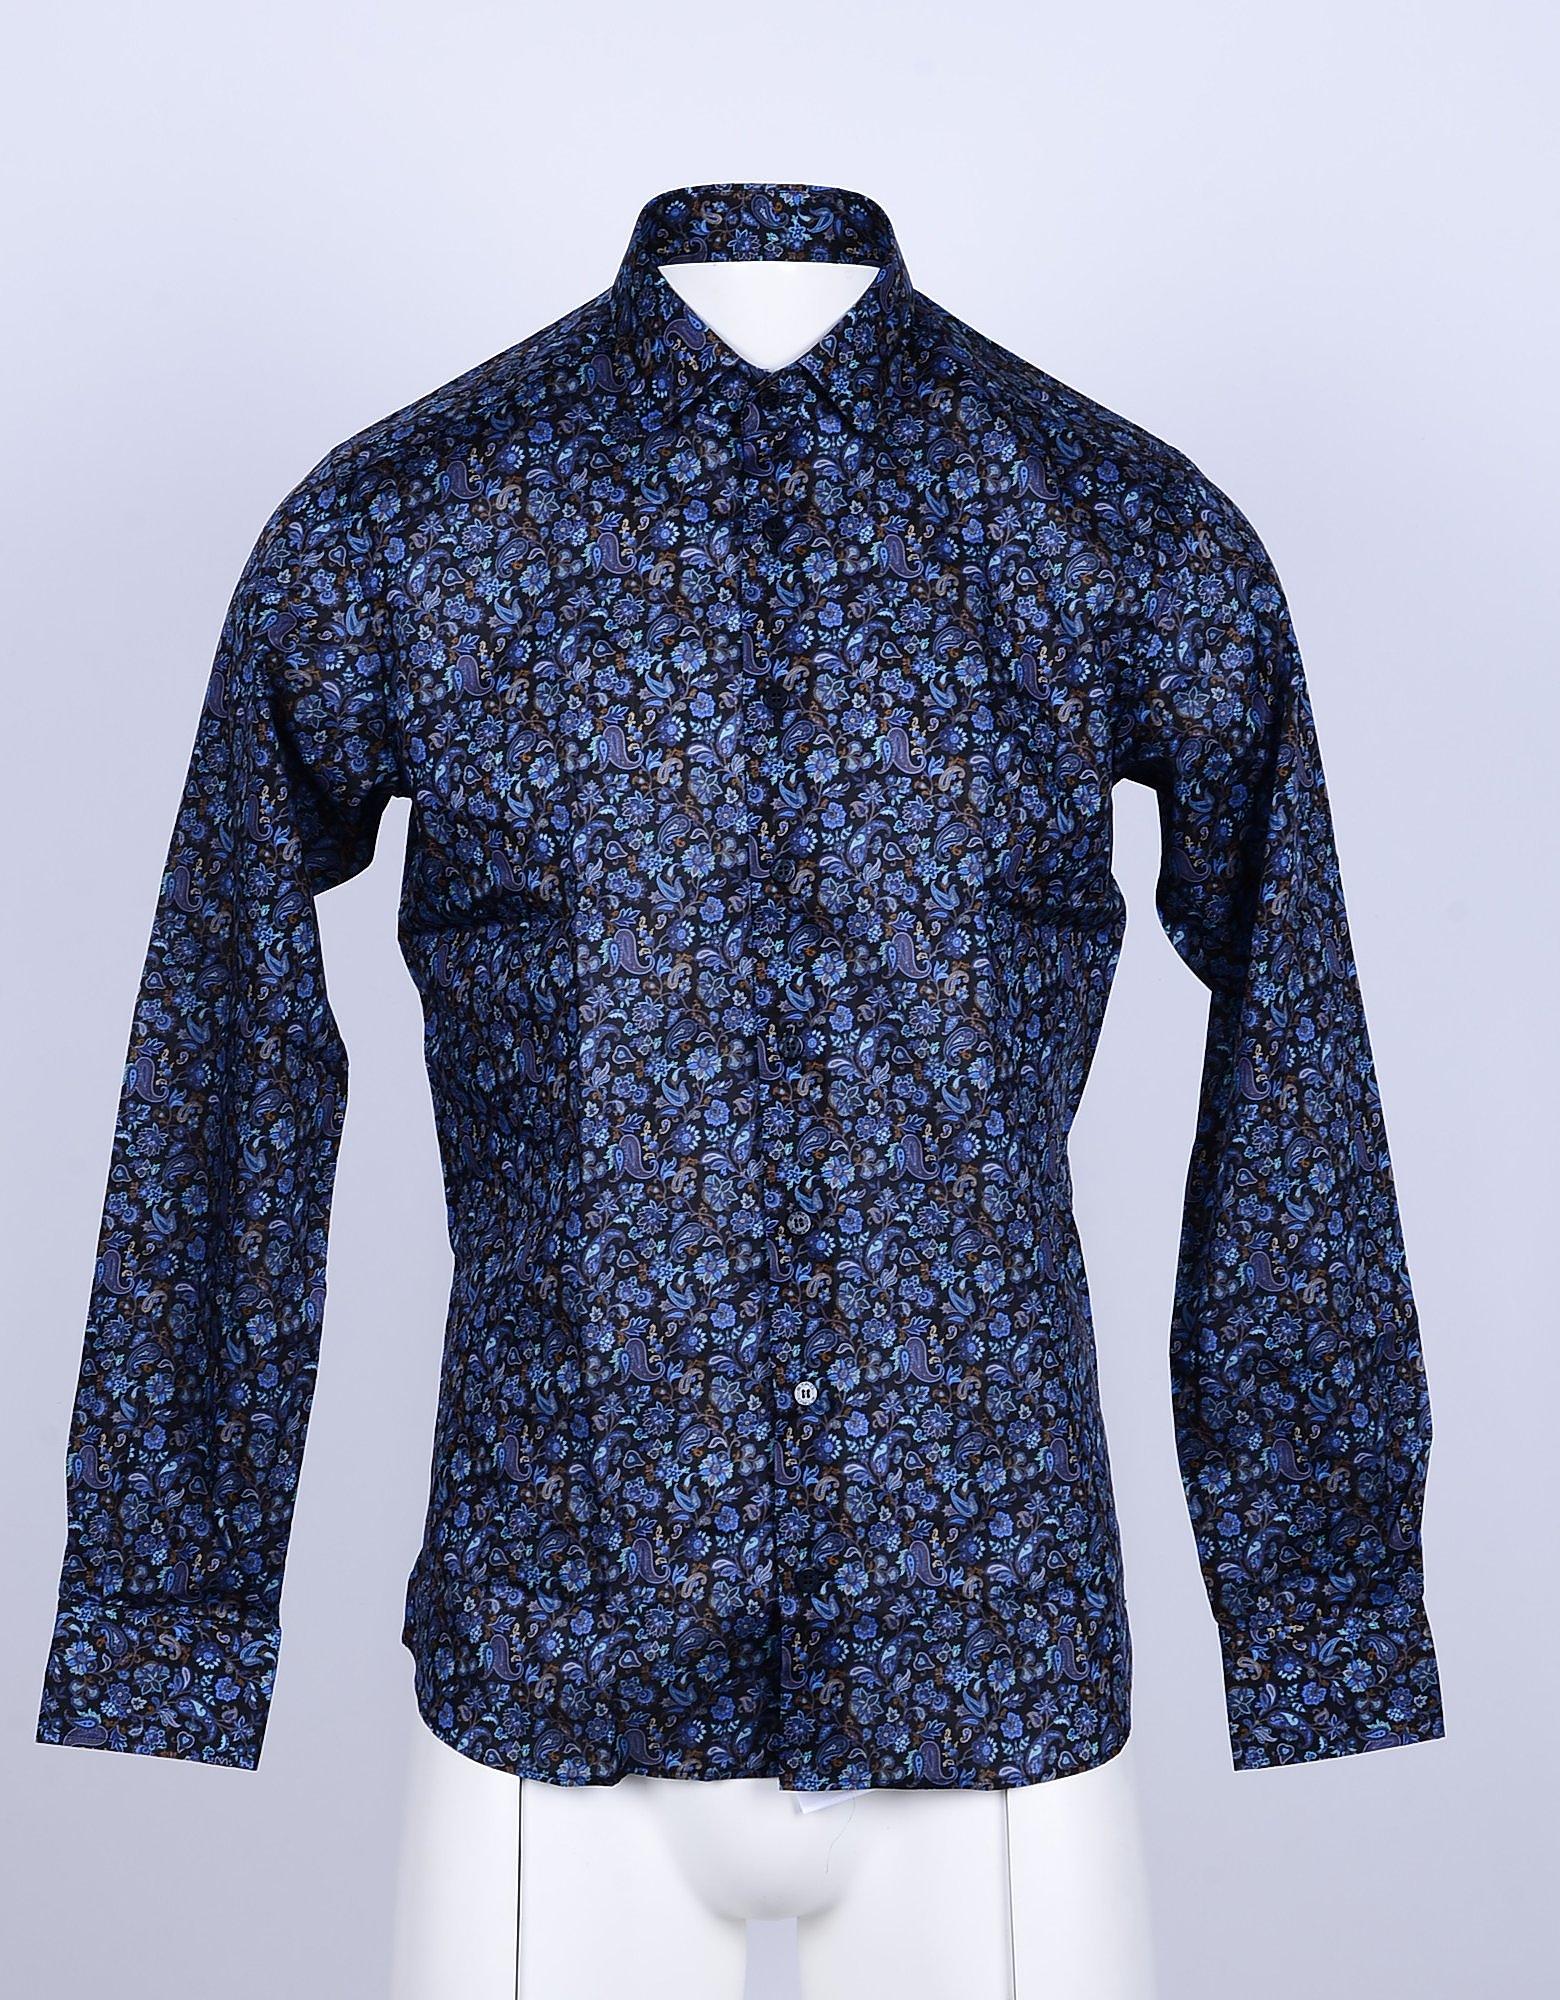 Etro Designer Shirts, Blue Printed Cotton Men's Shirt